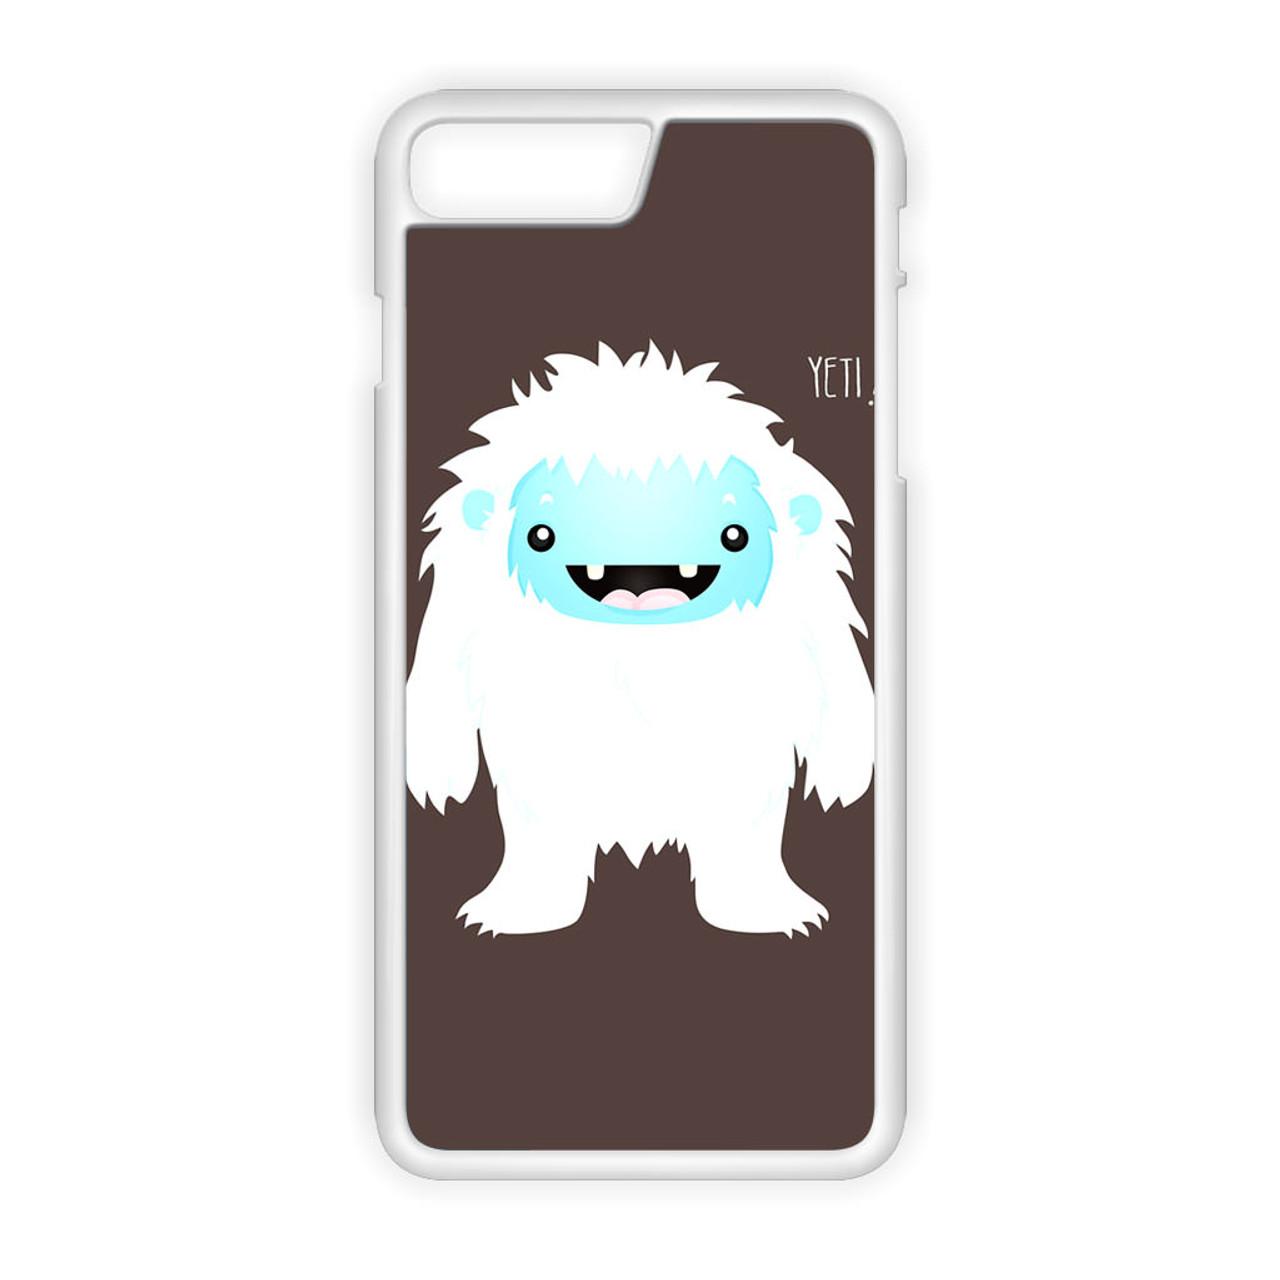 YETI iphone case